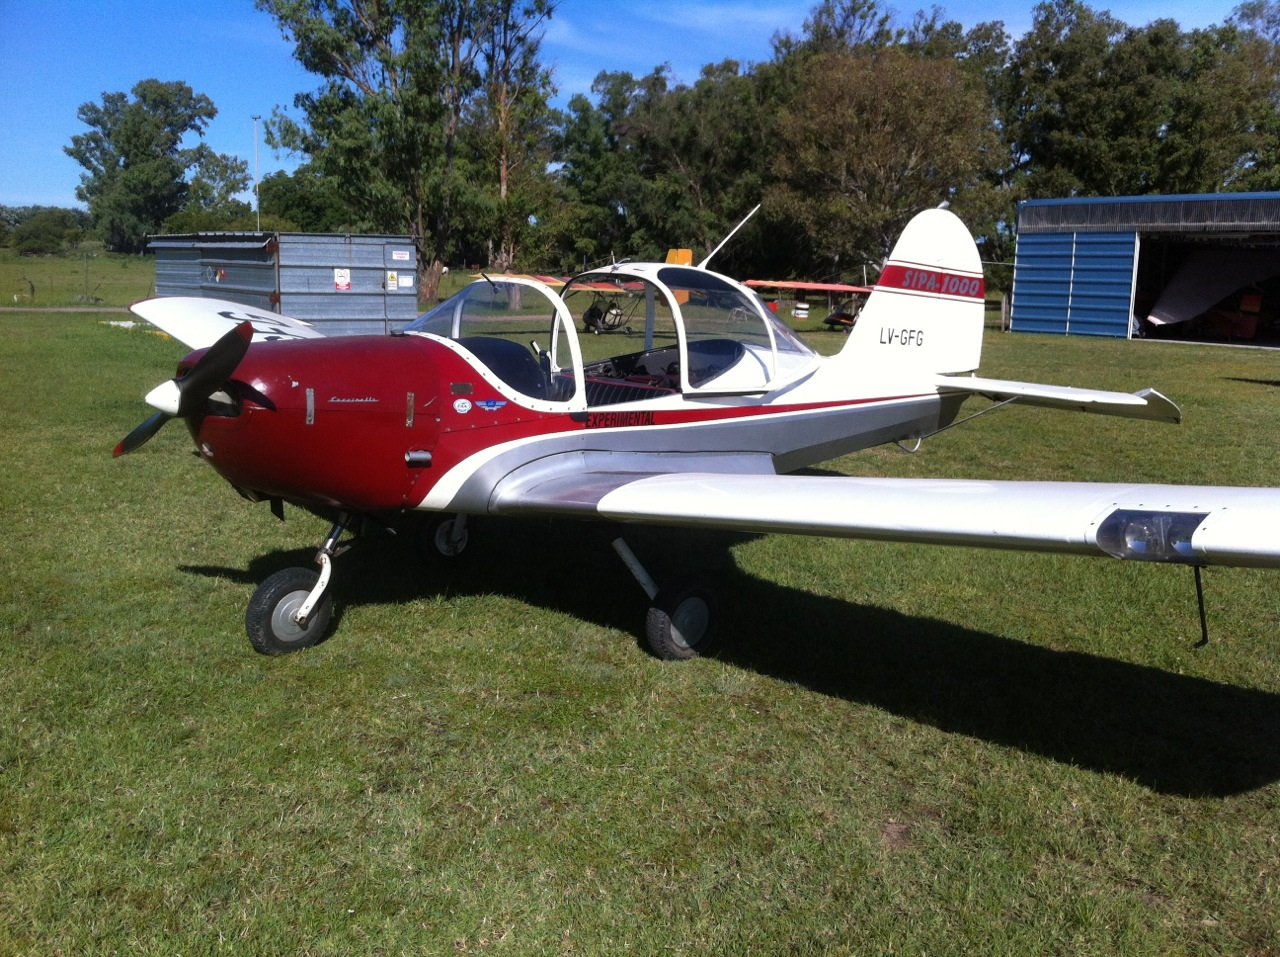 SIPA 1000 LV-GFG-4